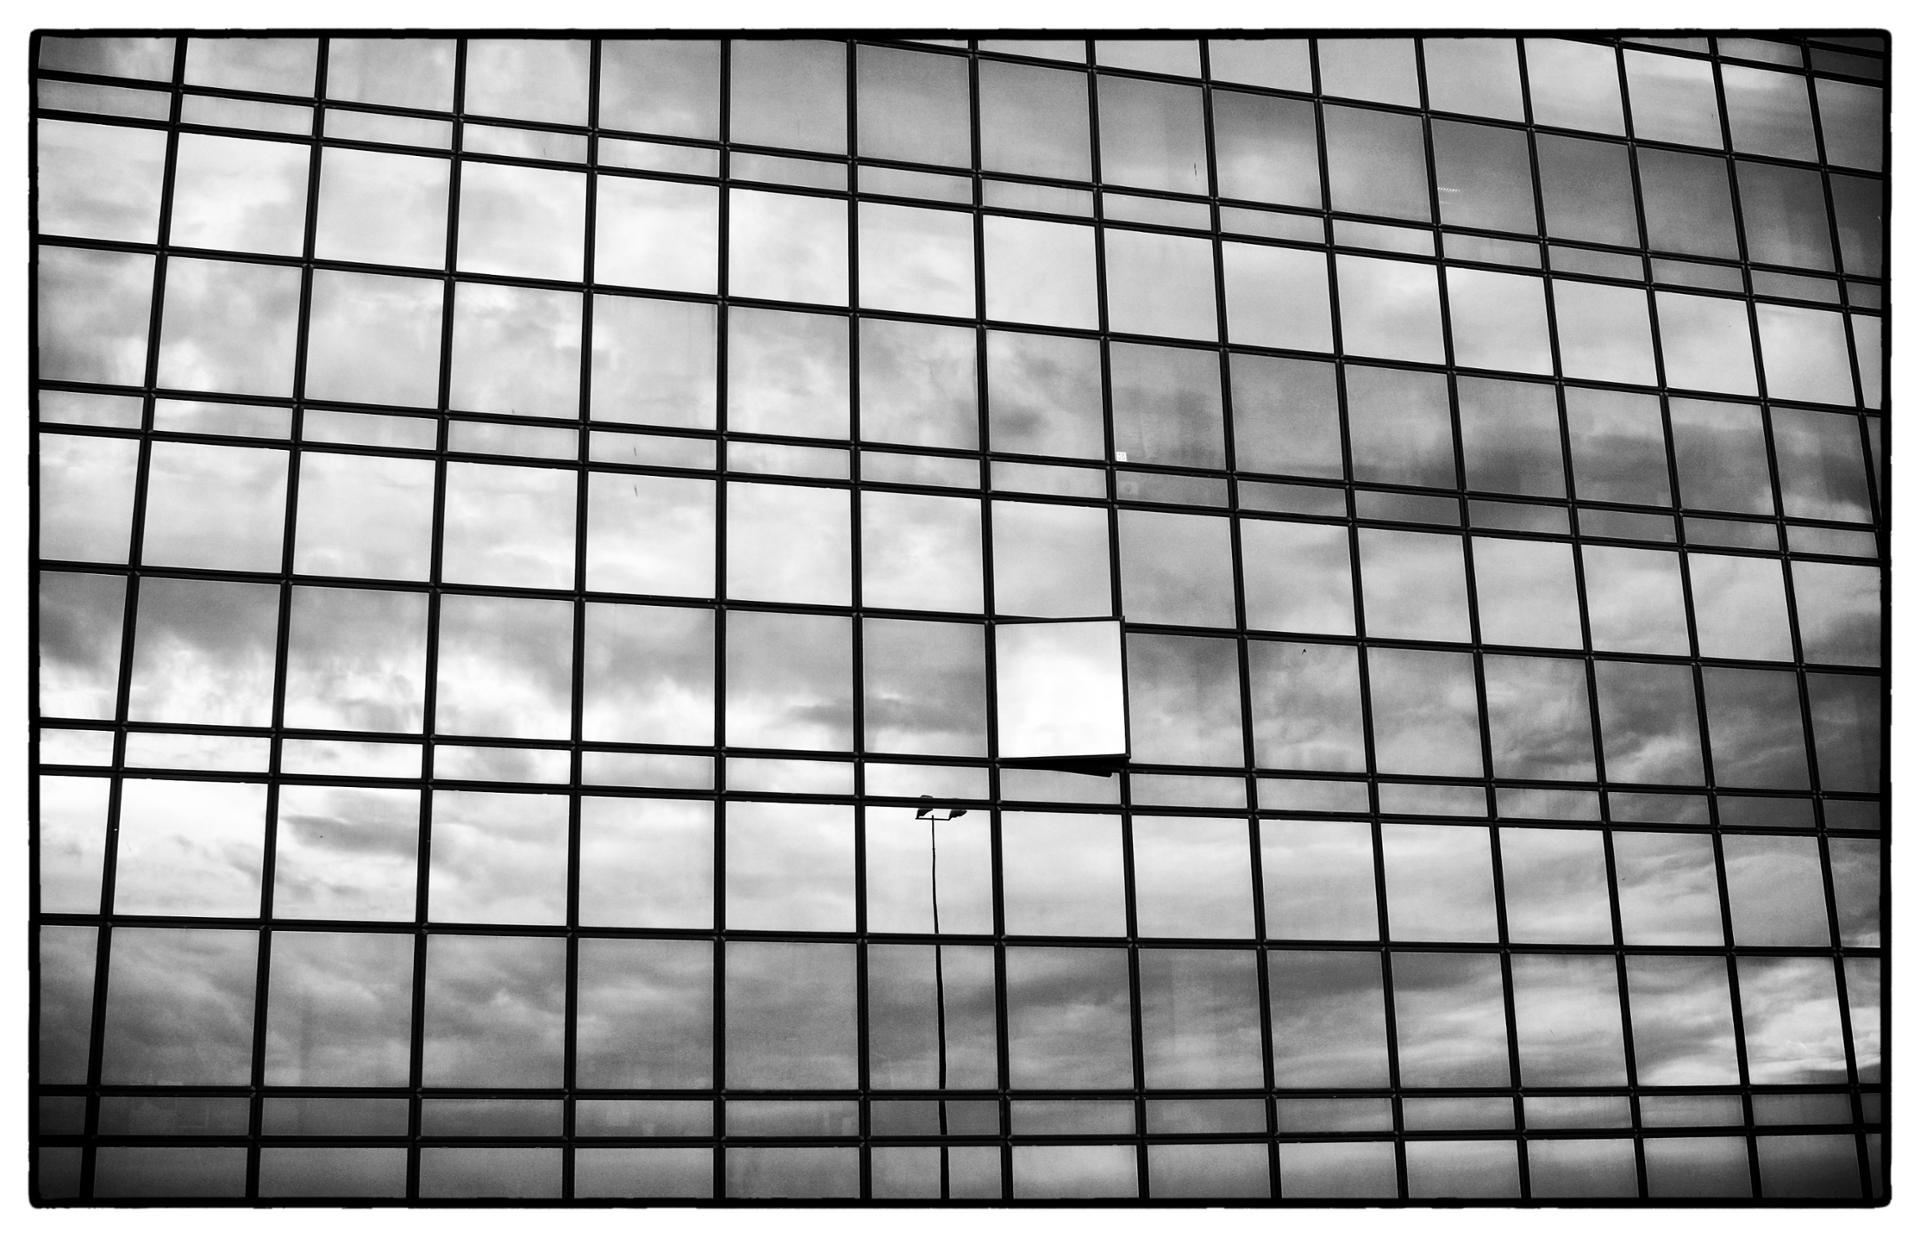 mirror clouds.JPG